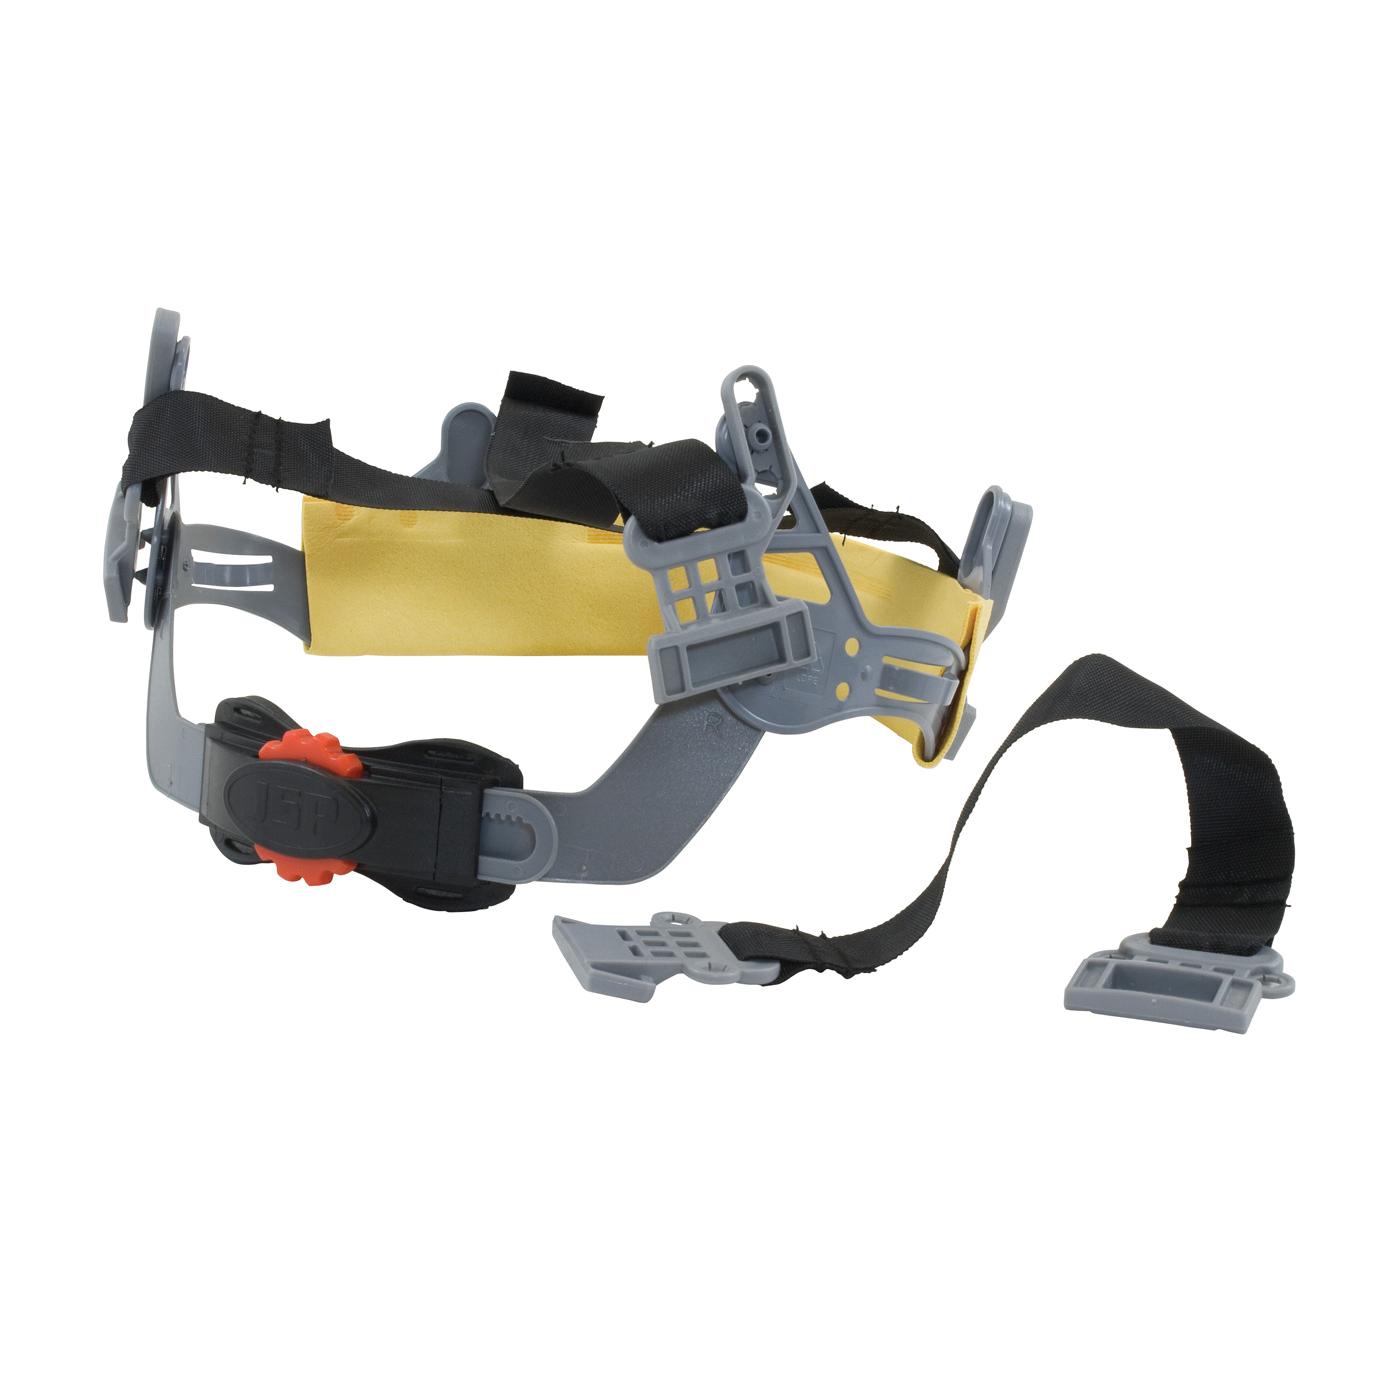 JSP® 251-01-6225 Surefit™ Hard Hat Adapter, For Use With JSP® Surefit™ Safety Visors and Surefit™ Contour Ear Muffs, Clear